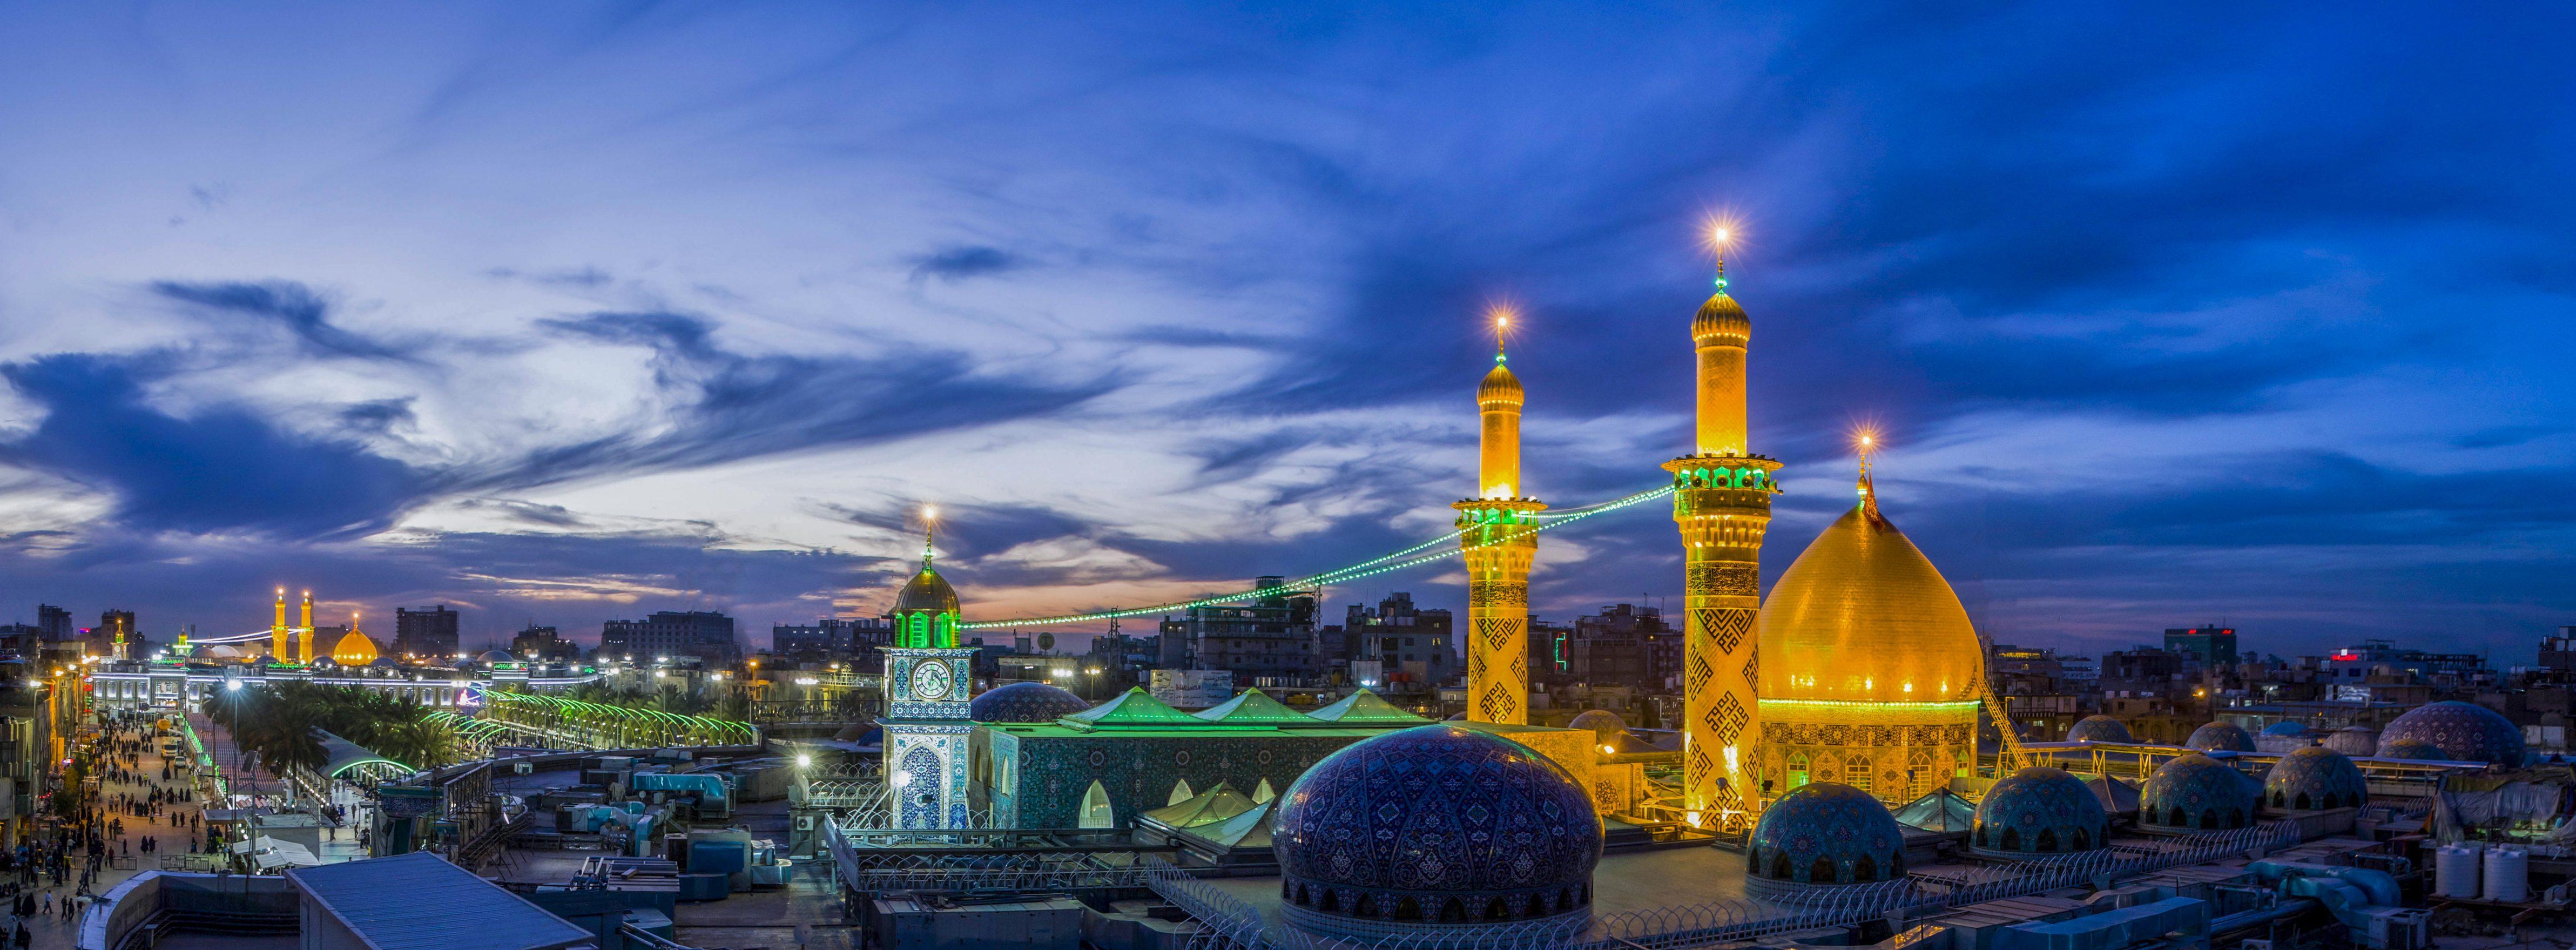 سلام بر محرم تو یااباعبدالله(ع)